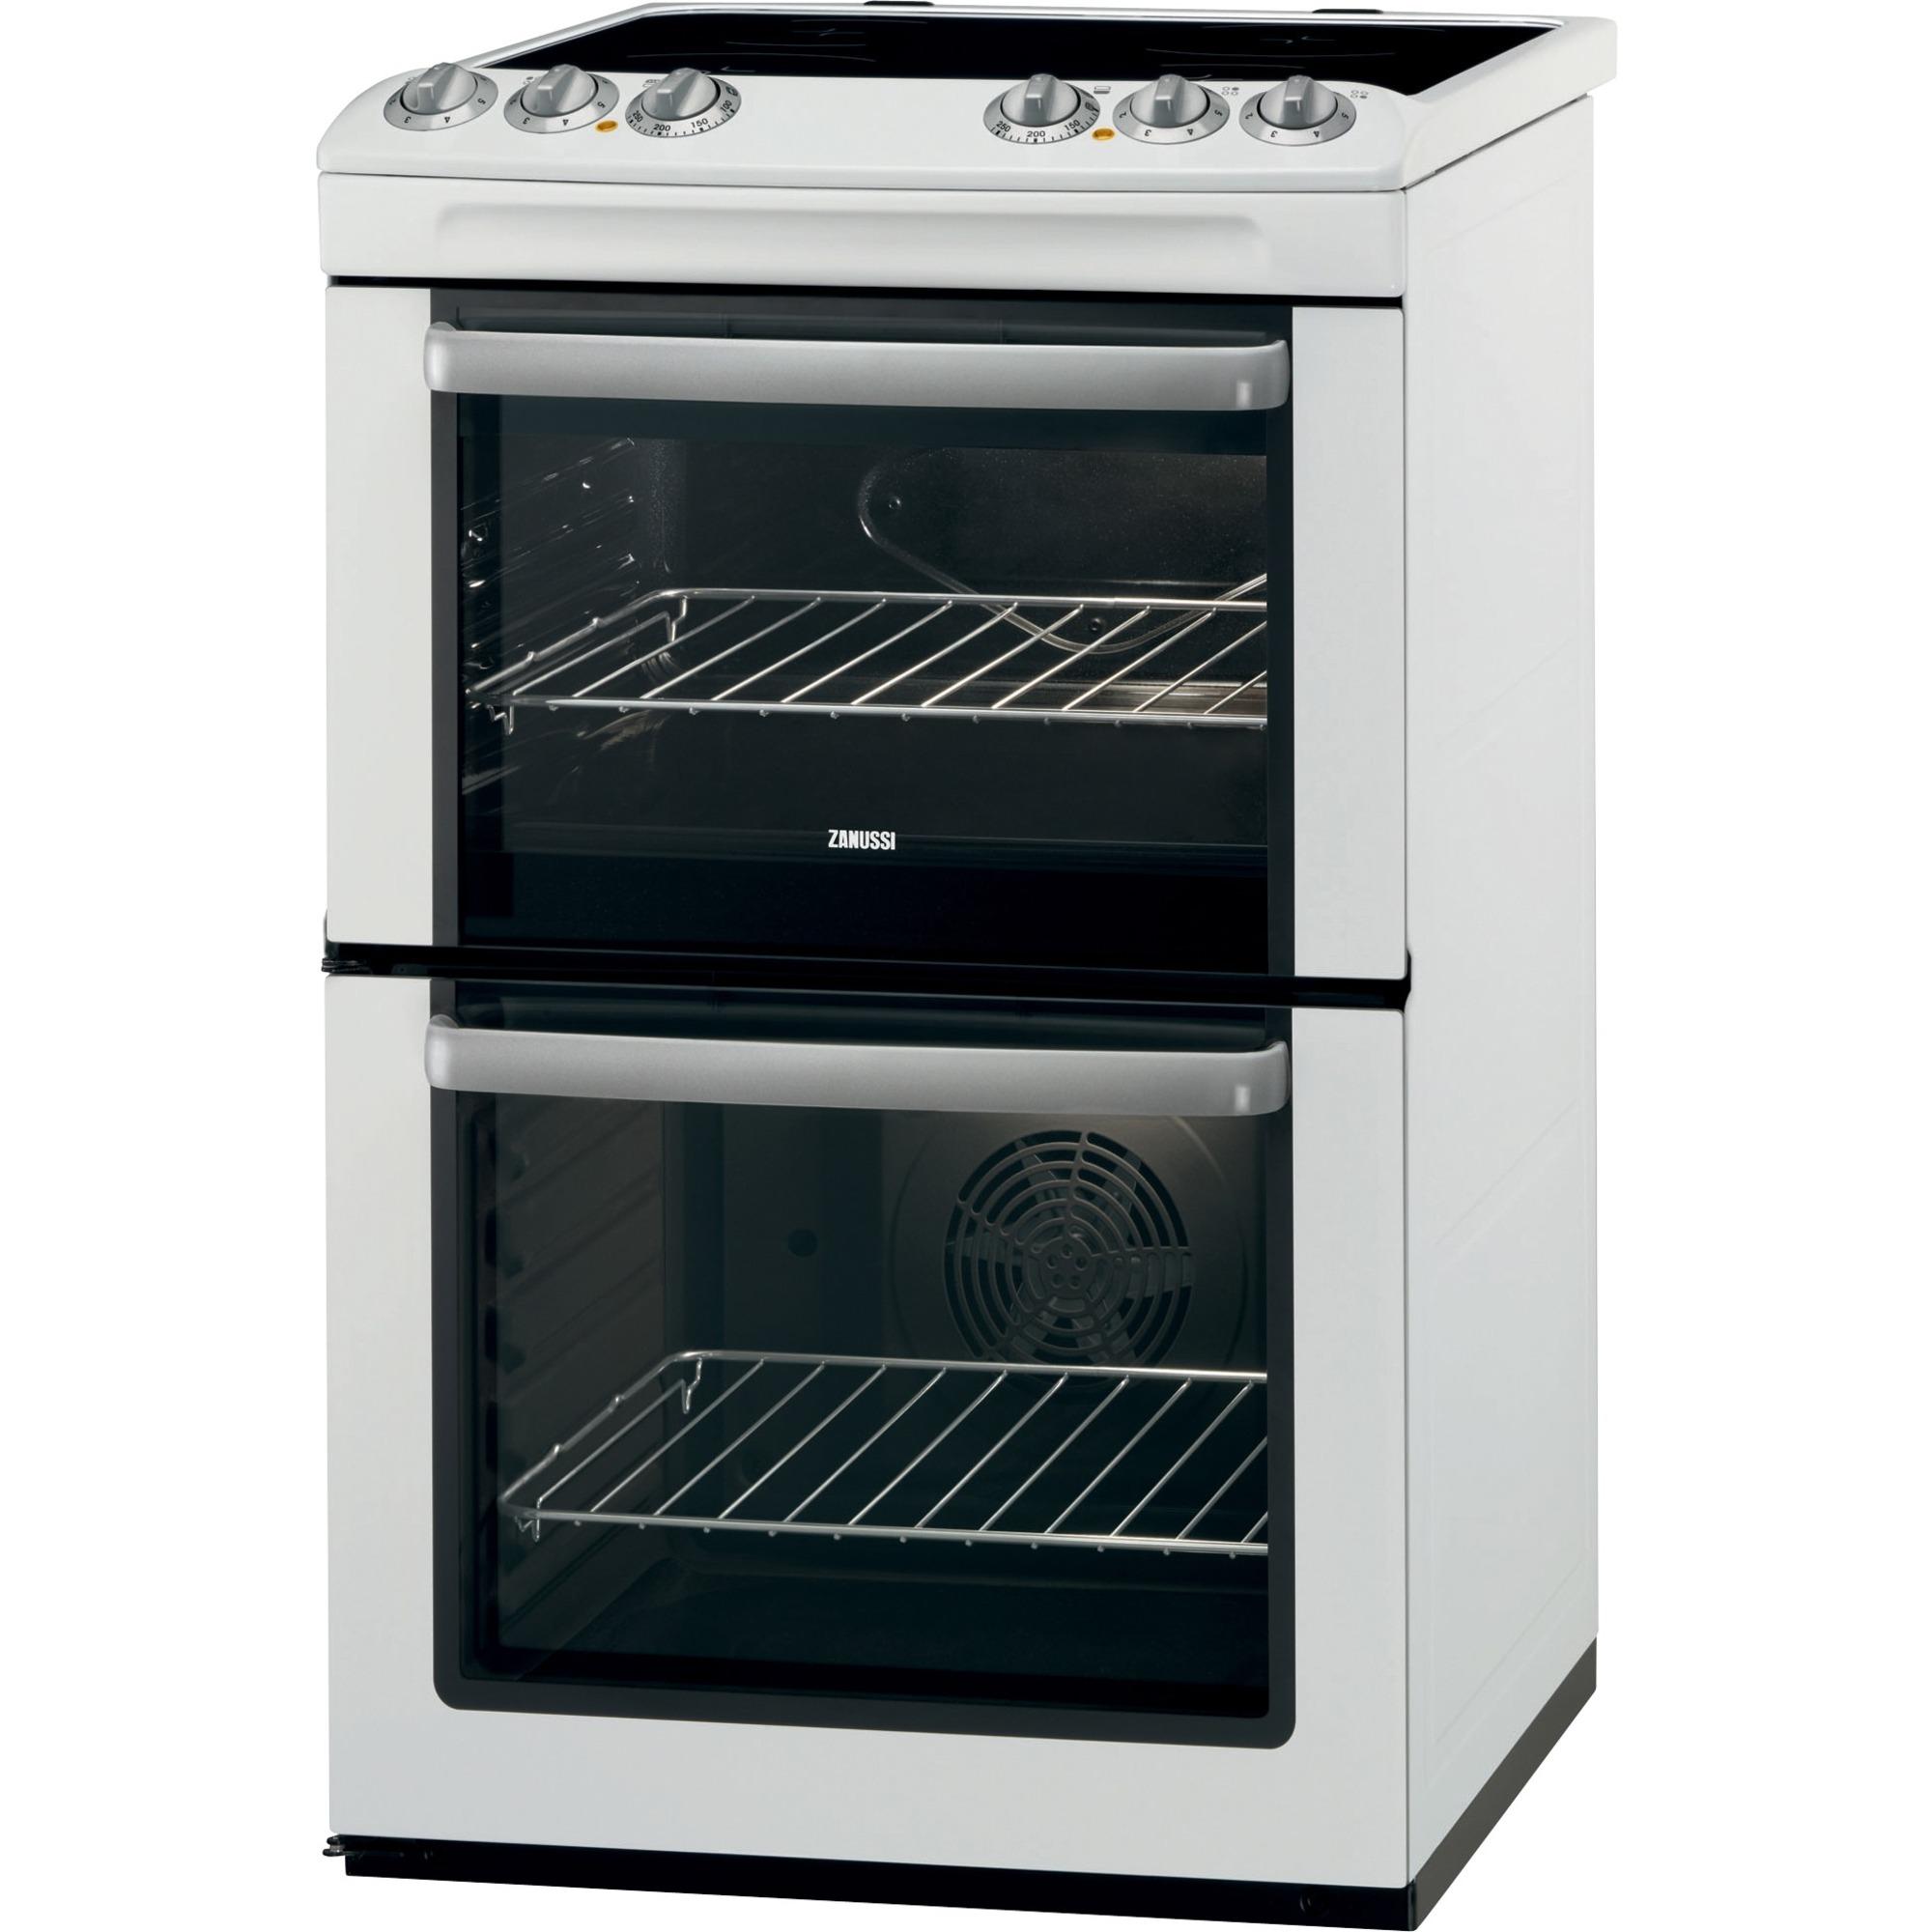 Zanussi Double Oven Cooker with Ceramic Hob  ZCV554MW -> Kuchnia Gazowa Bosch